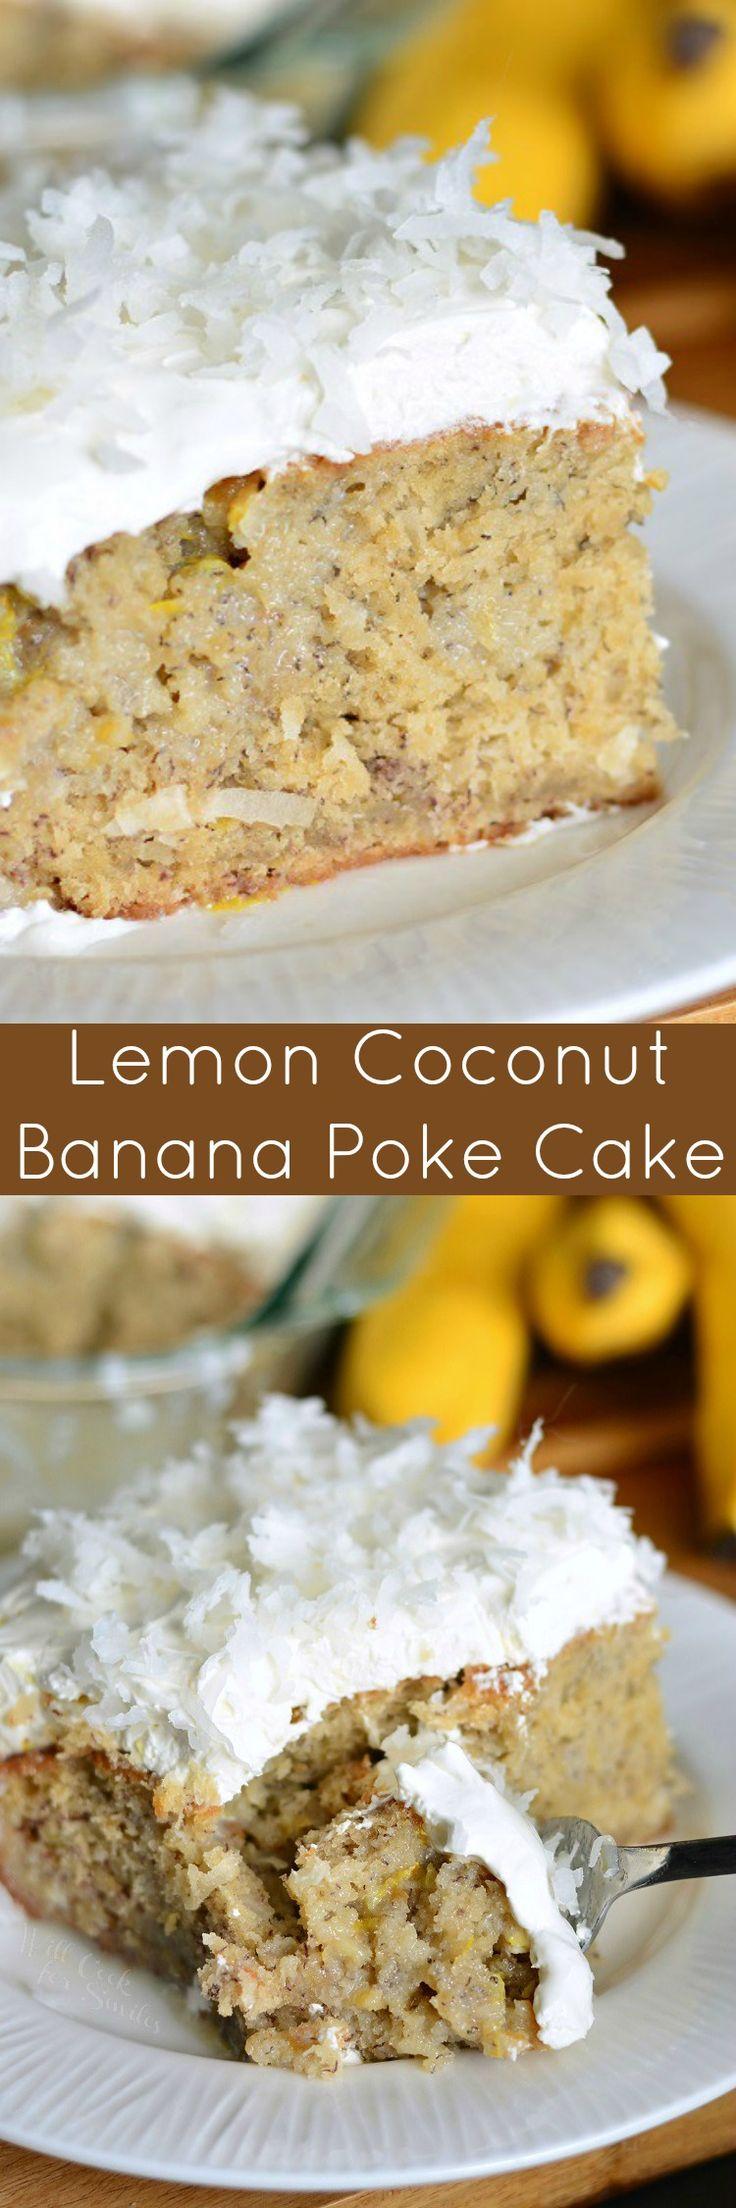 Lemon Coconut Banana Poke Cake. Soft and moist banana cake made with coconut and lemon flavors from top to bottom. #bananacake #pokecake #coconut #banana #dessert